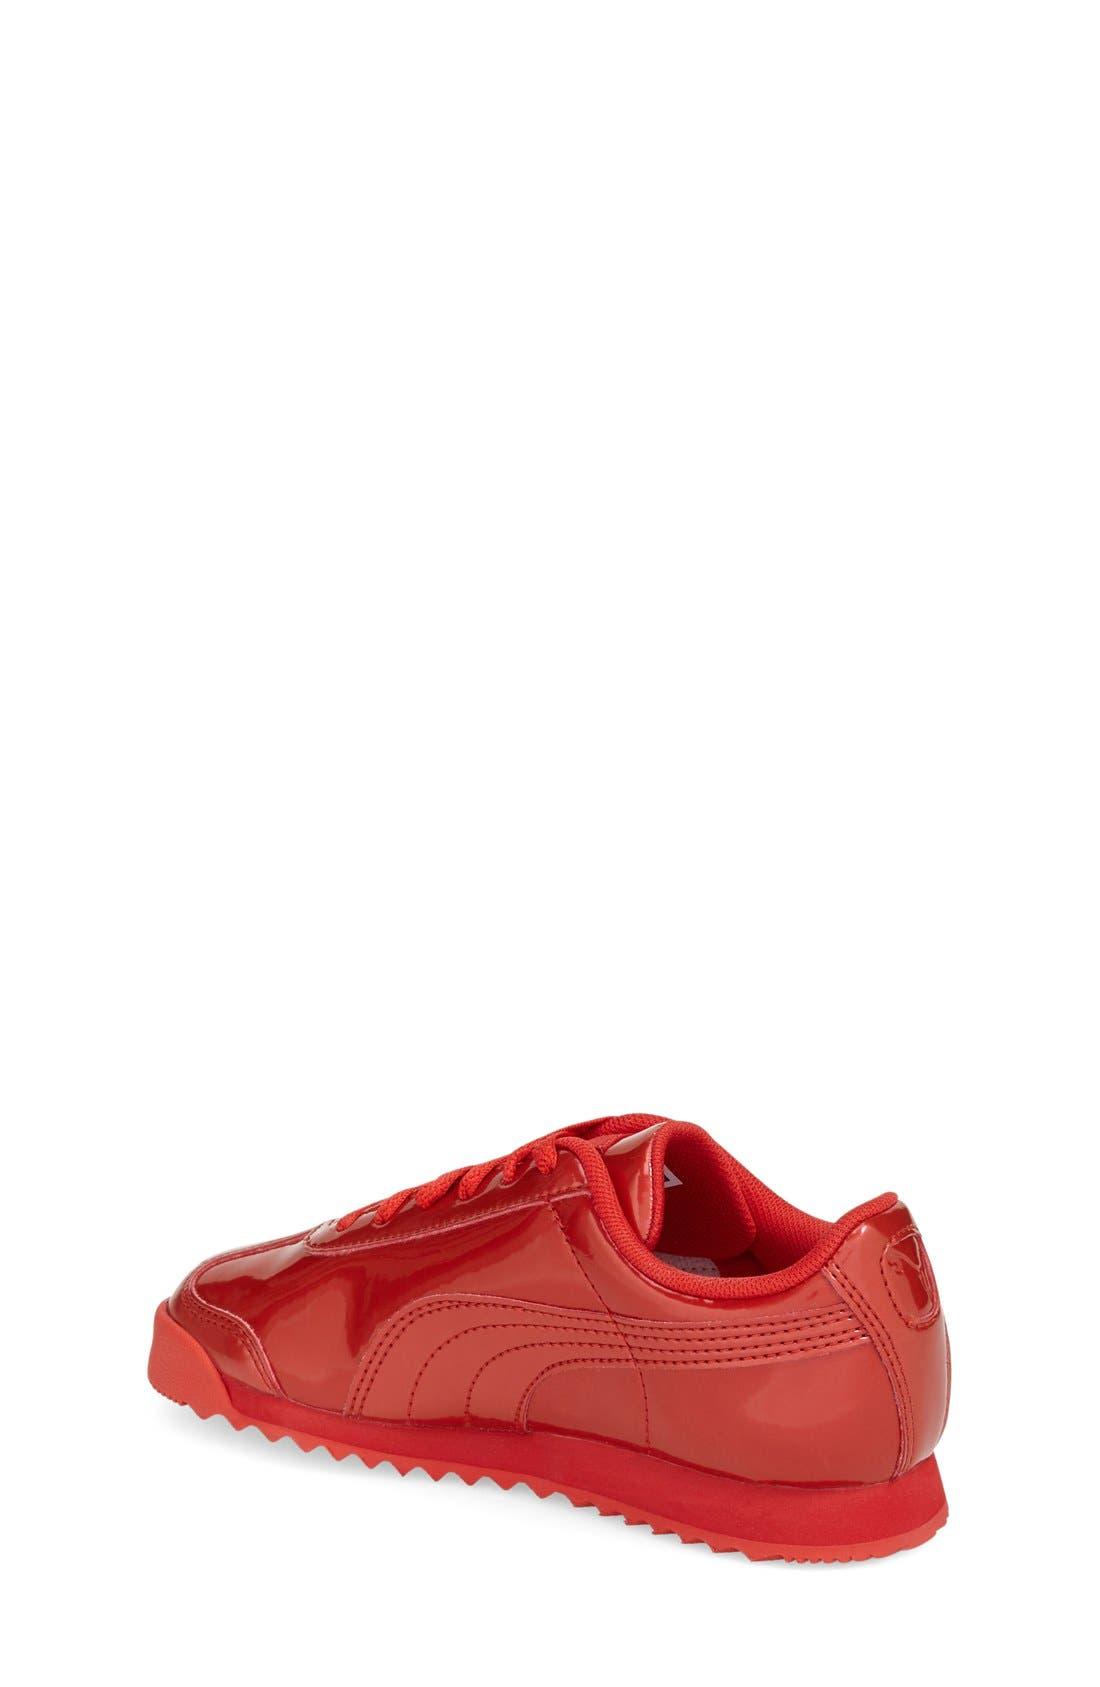 Alternate Image 2  - PUMA 'Roma' Sneaker (Toddler, Little Kid & Big Kid)